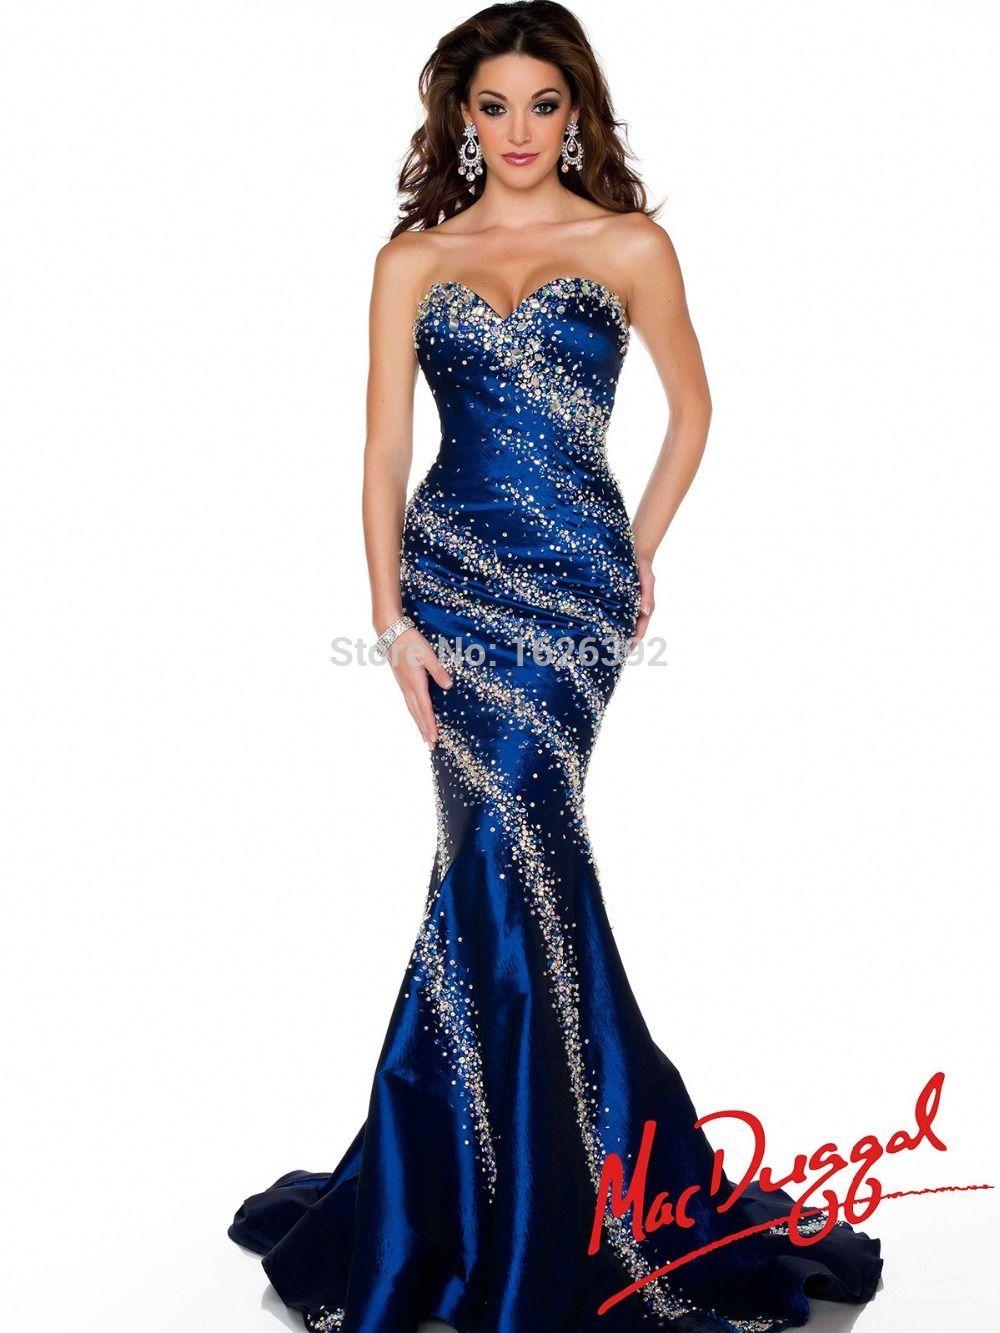 Pin by Alicia Lumpkin on Dresses I Like | Pinterest | Blue mermaid ...